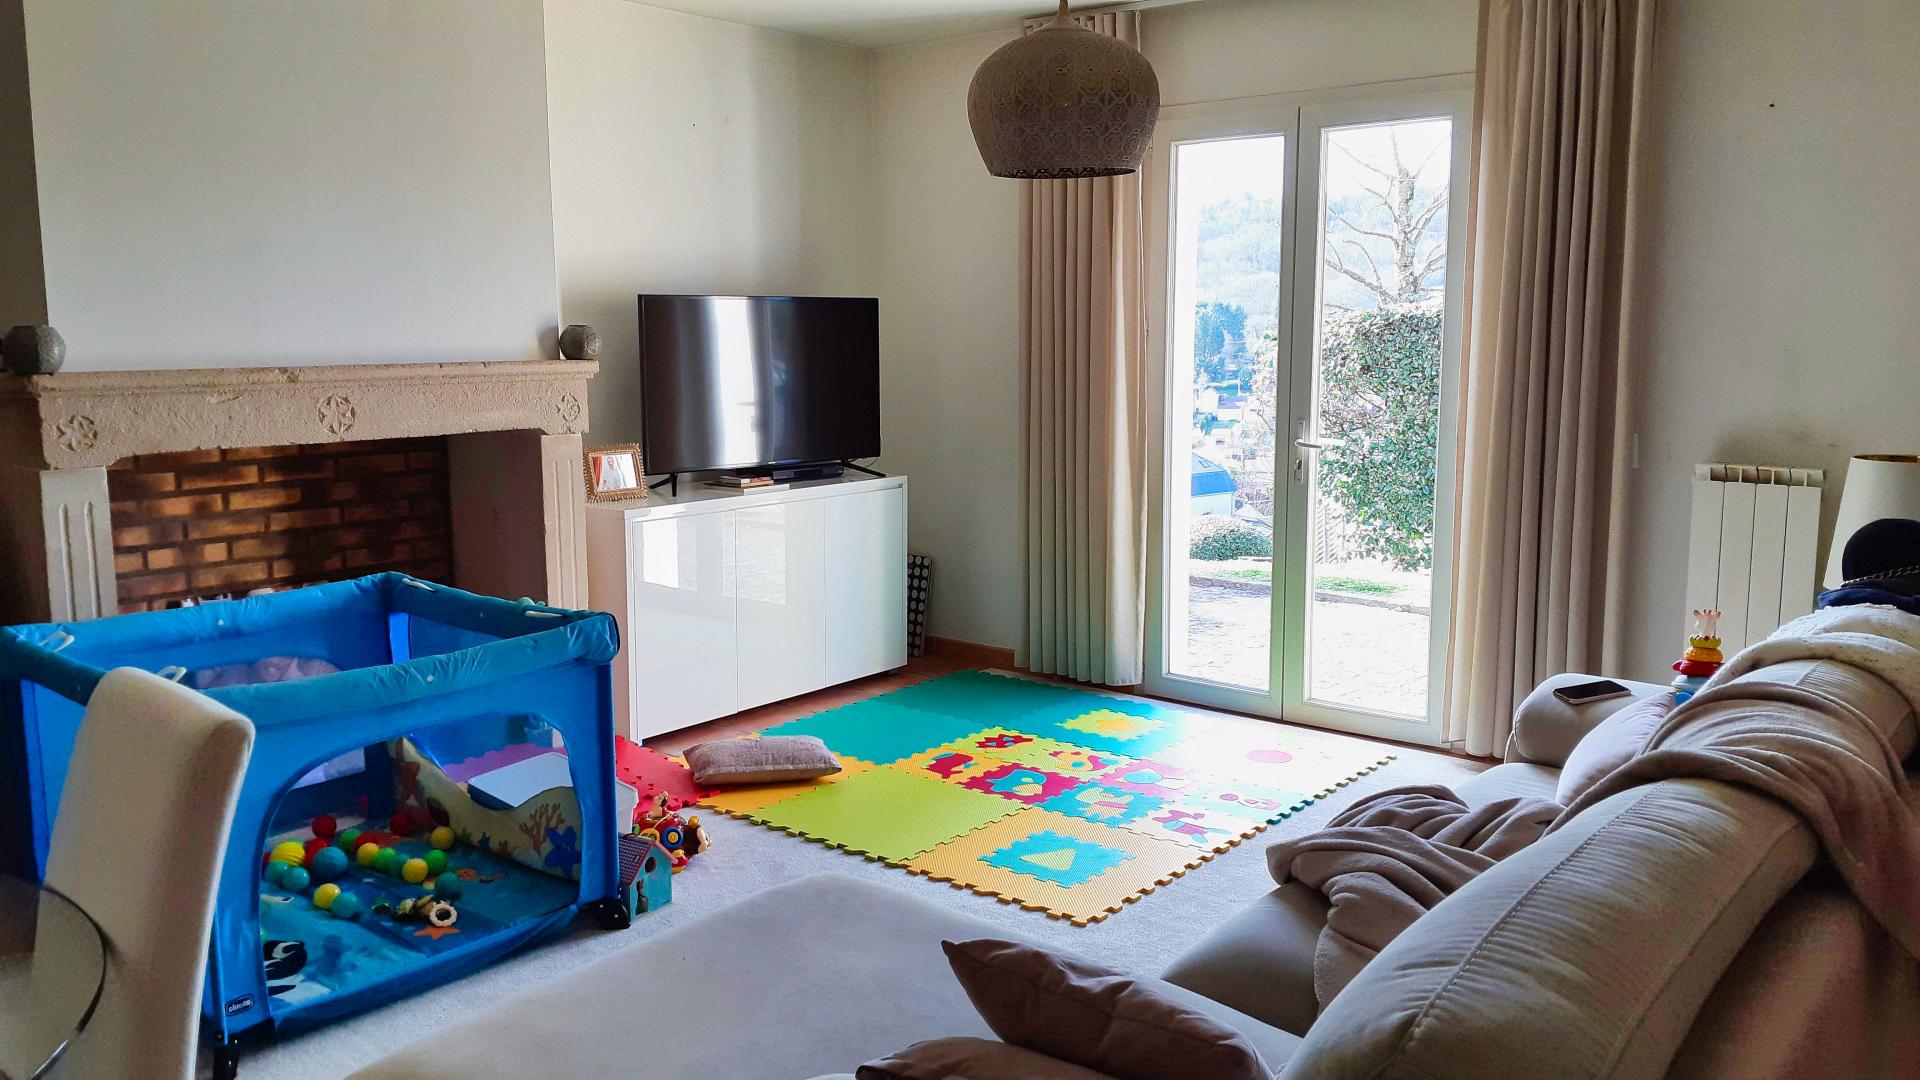 Sarlat- Appartement avec 2 chambres avec piscine chauffée